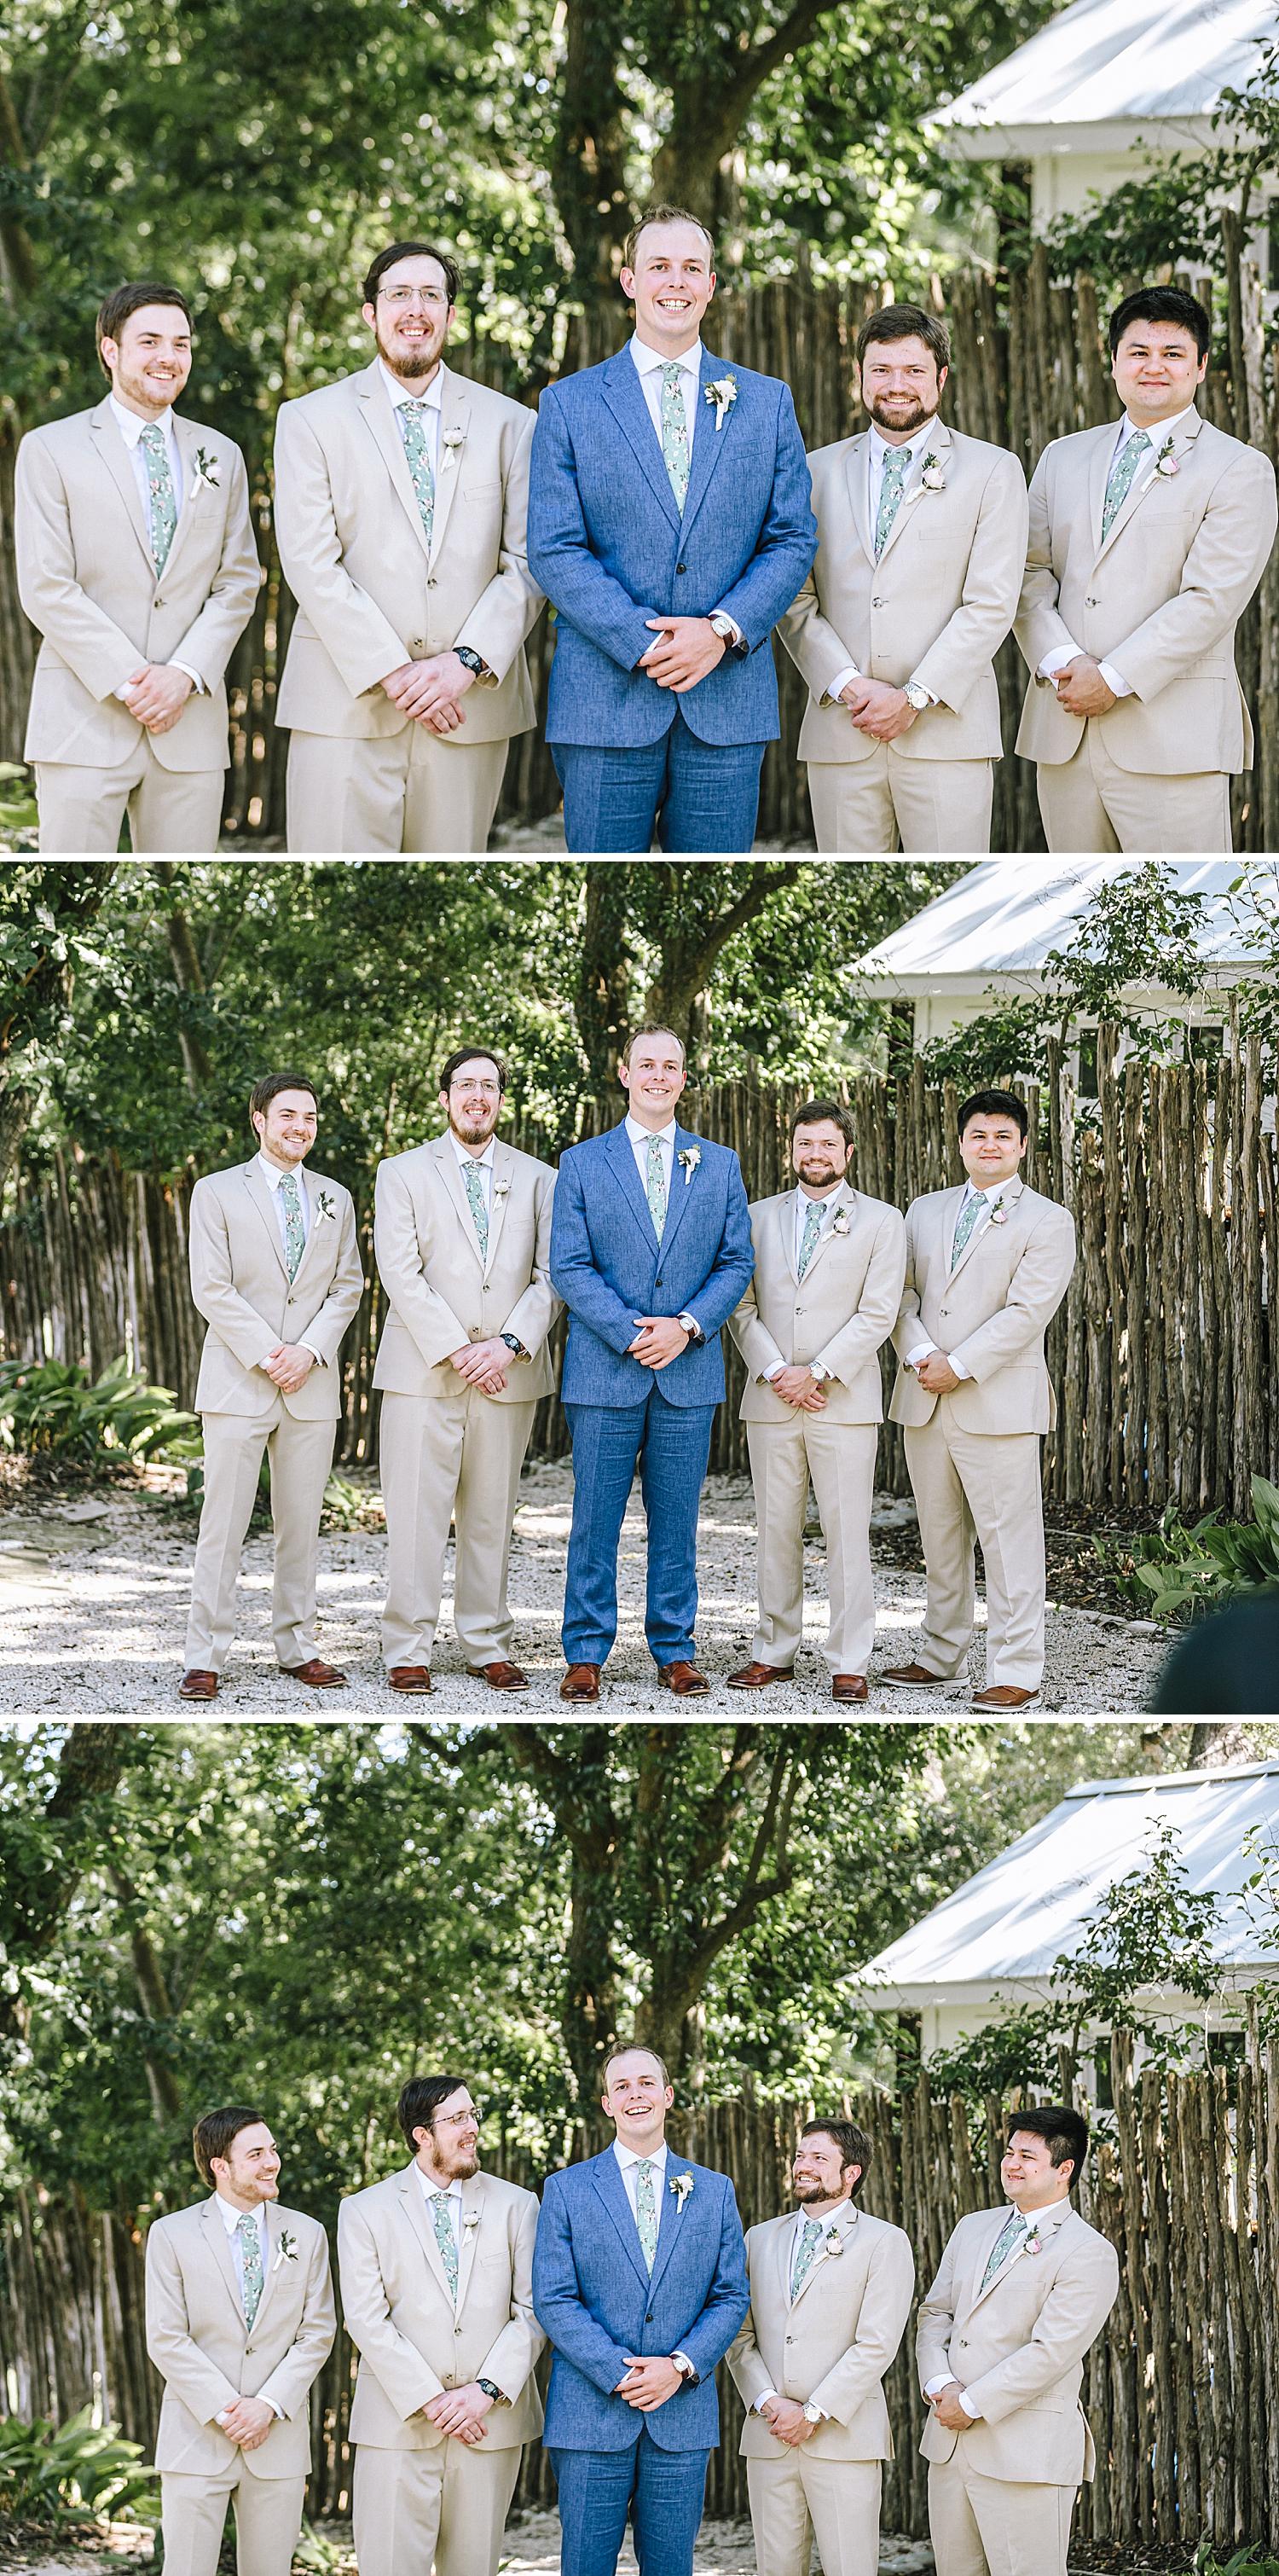 Gruene-Estate-Wedding-New-Braunfels-Bride-Wedding-Photos-Carly-Barton-Photography_0080.jpg